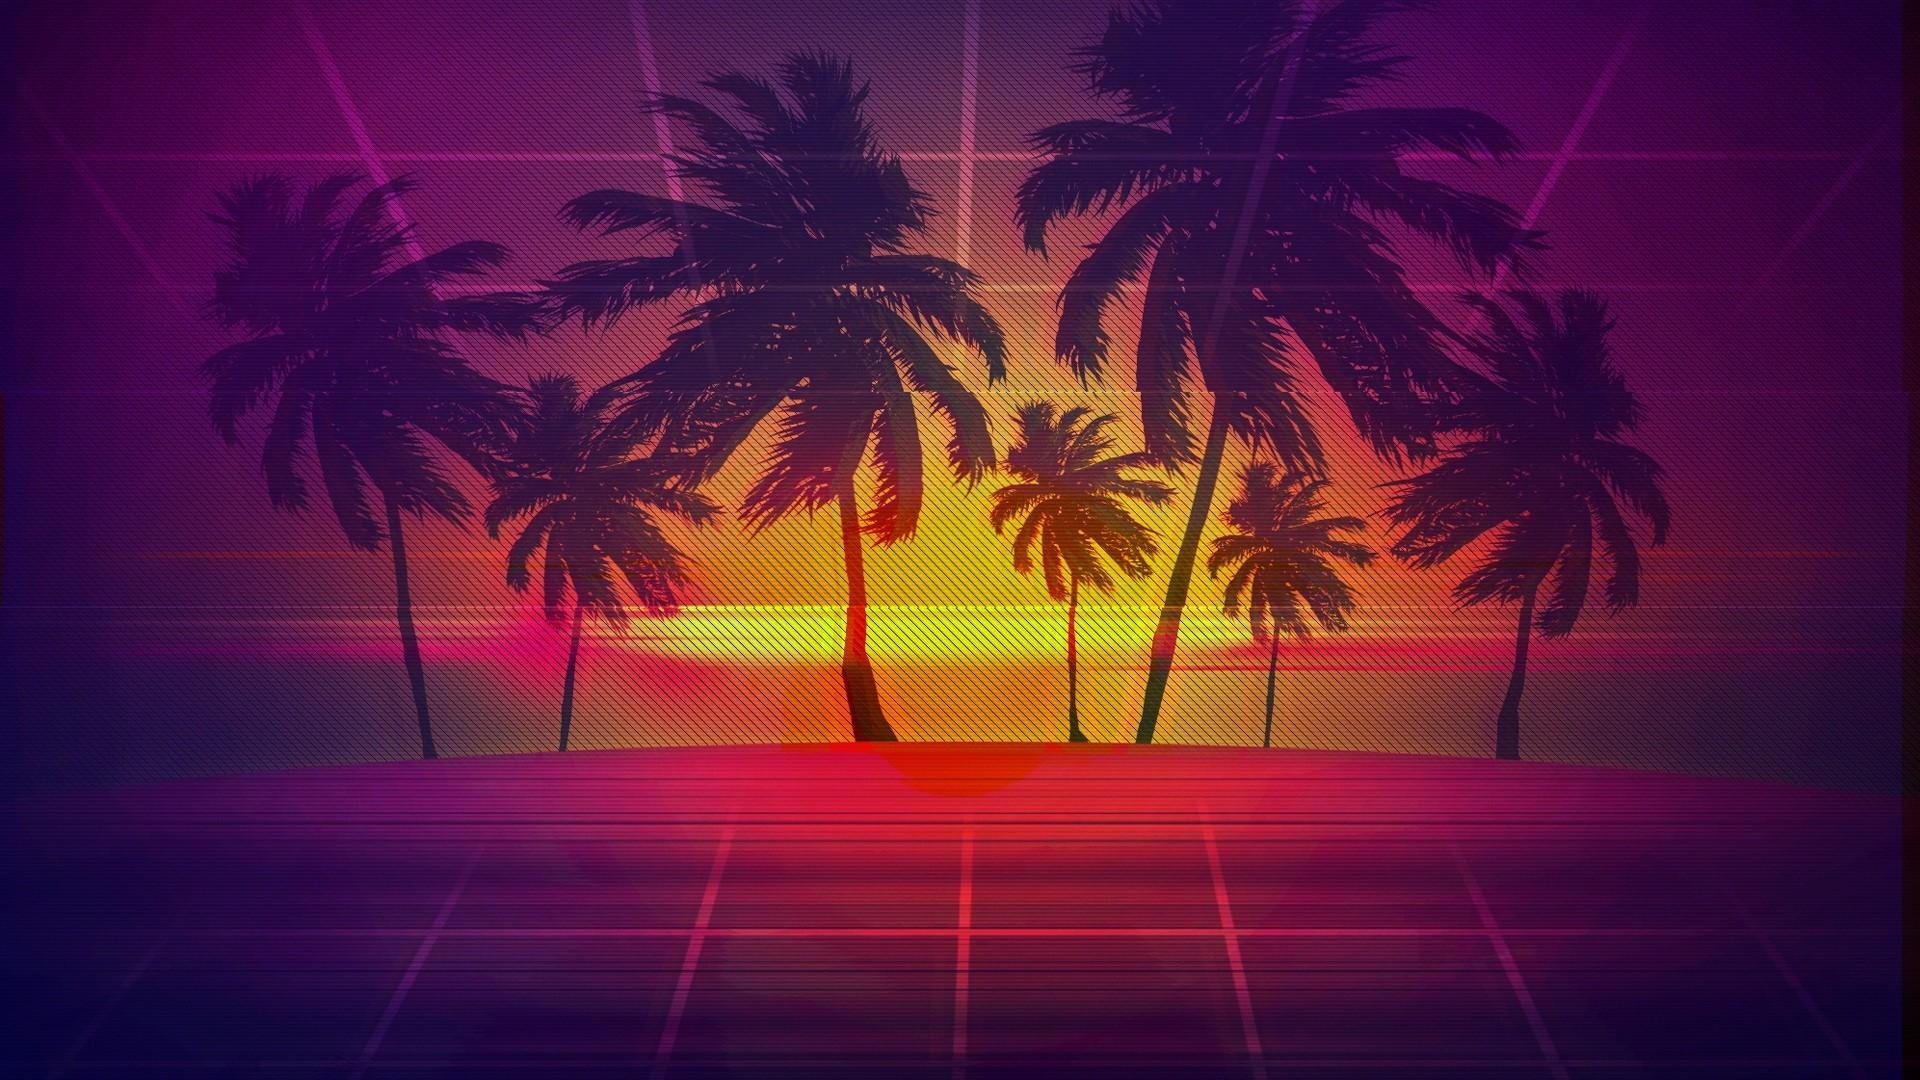 Hotline Miami hd desktop wallpaper